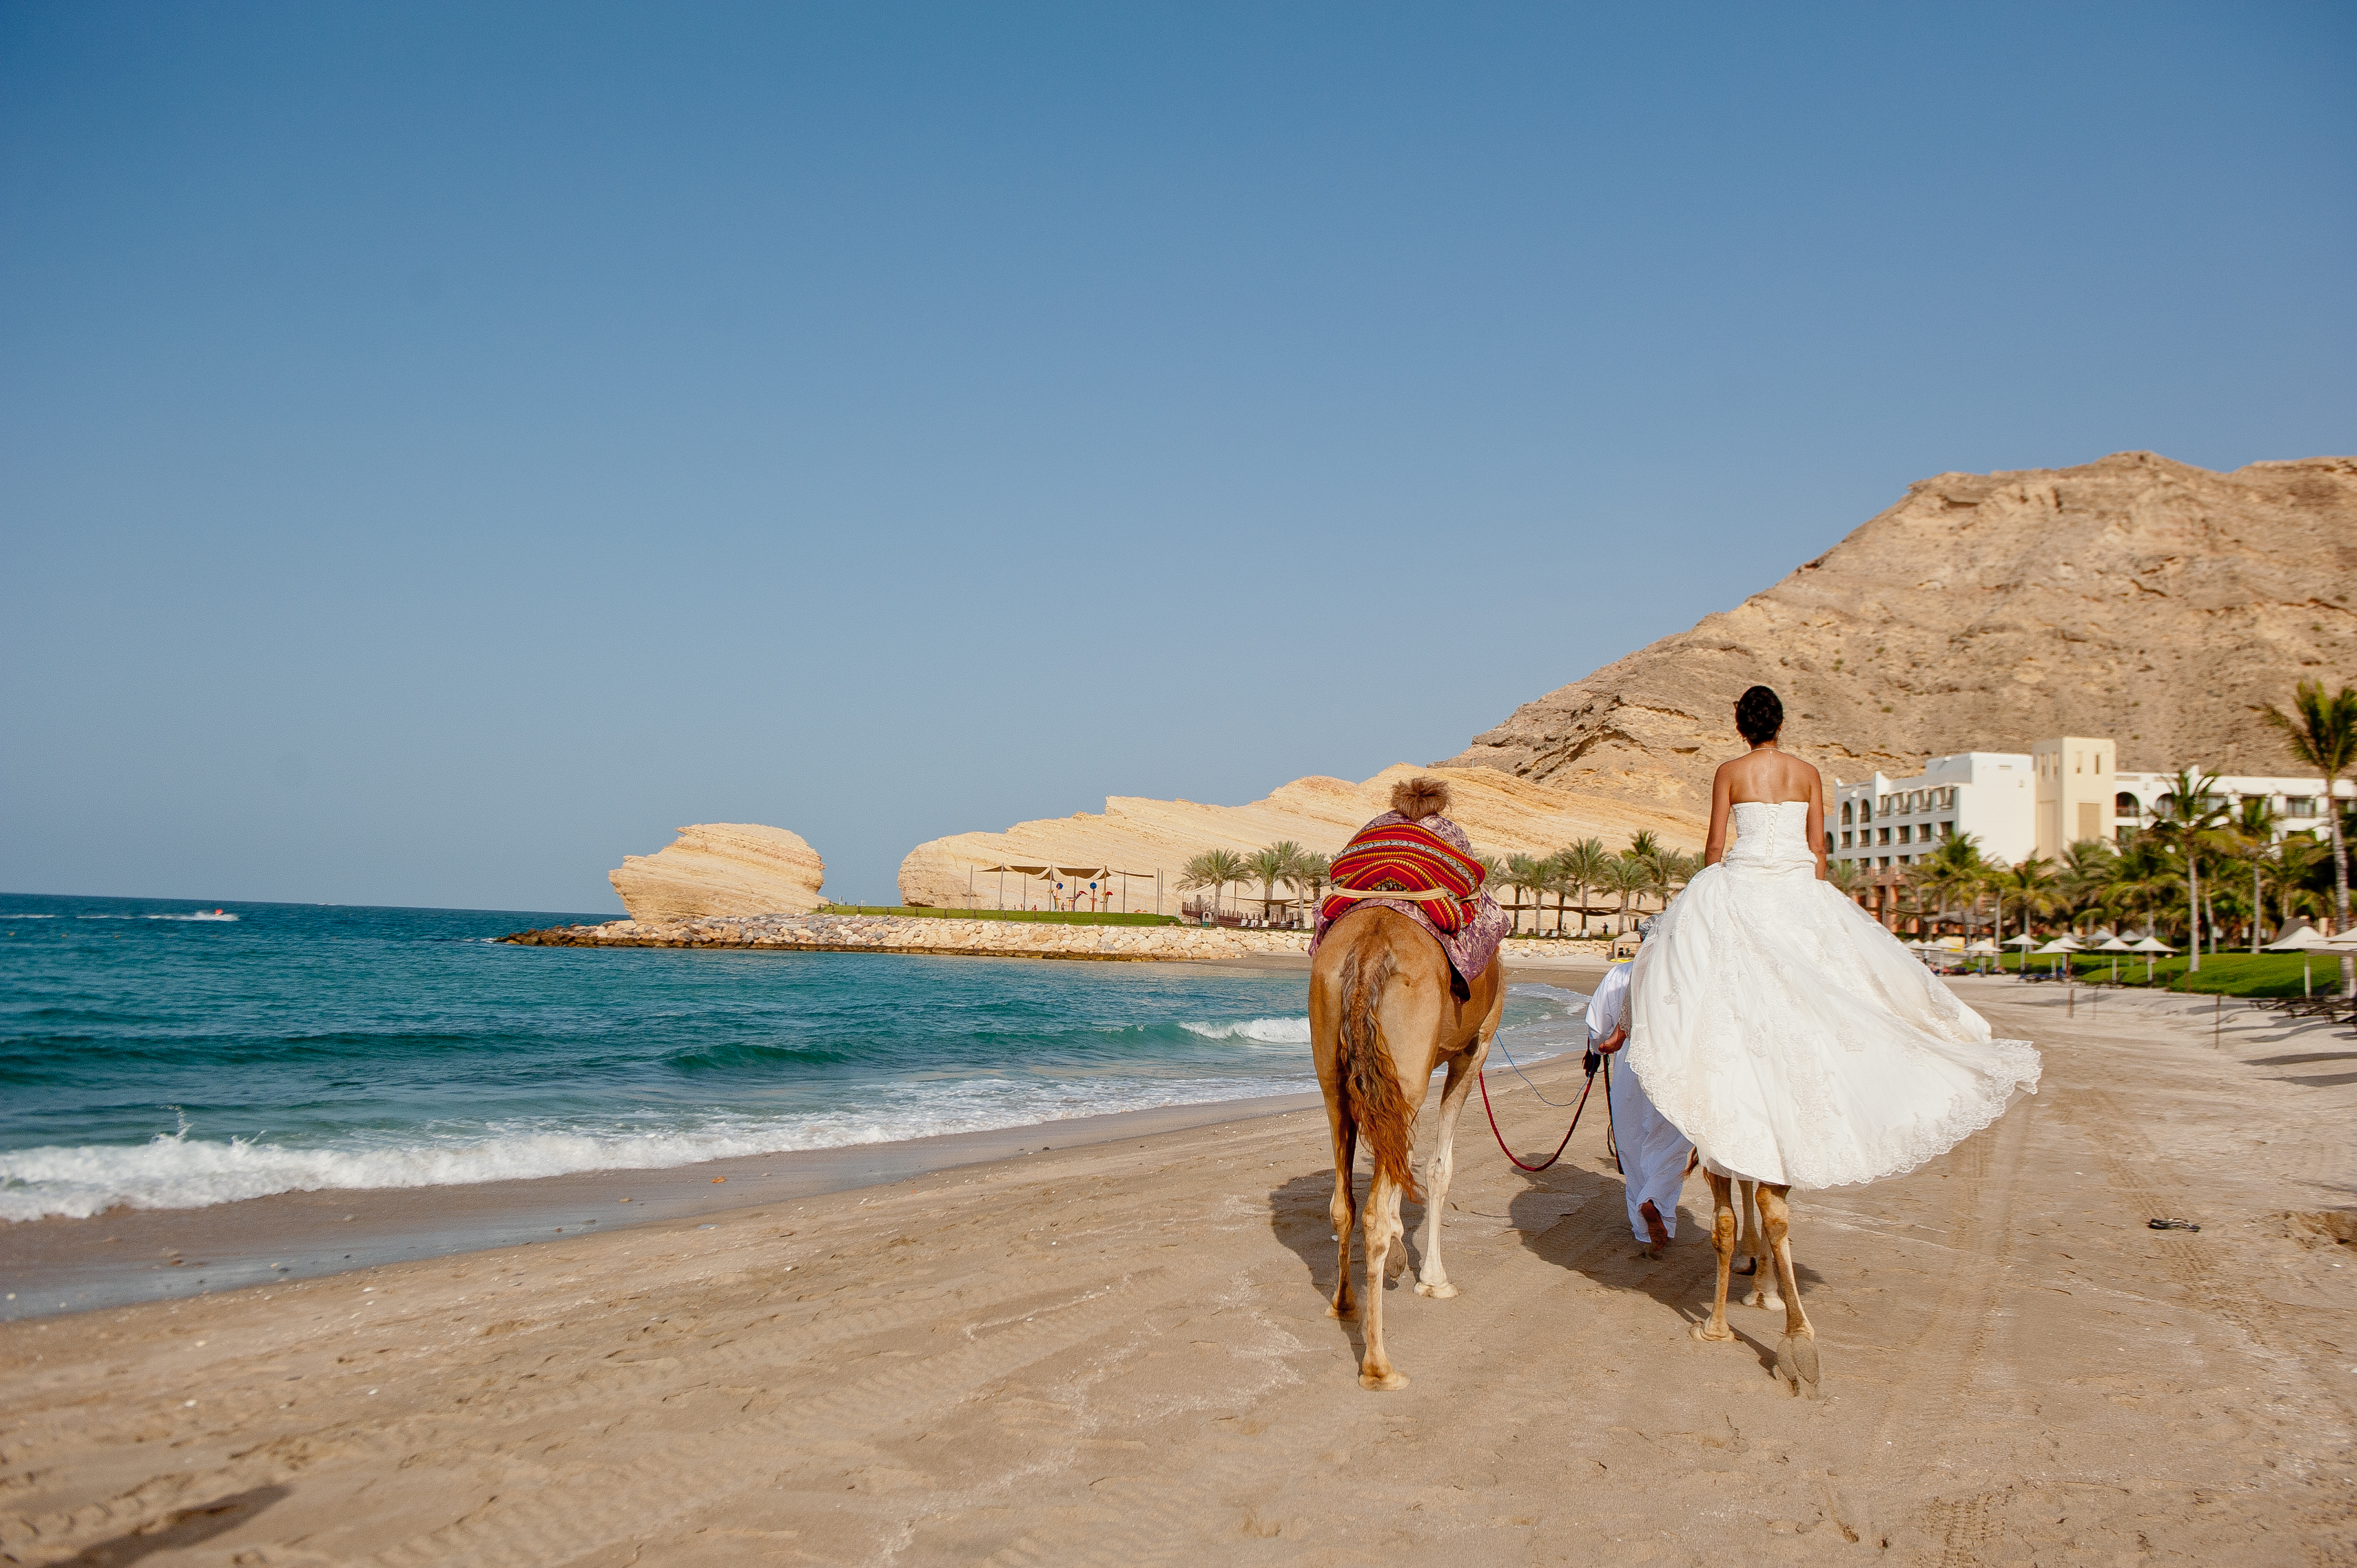 Oman-Dubai-Qatar-Photographer-040